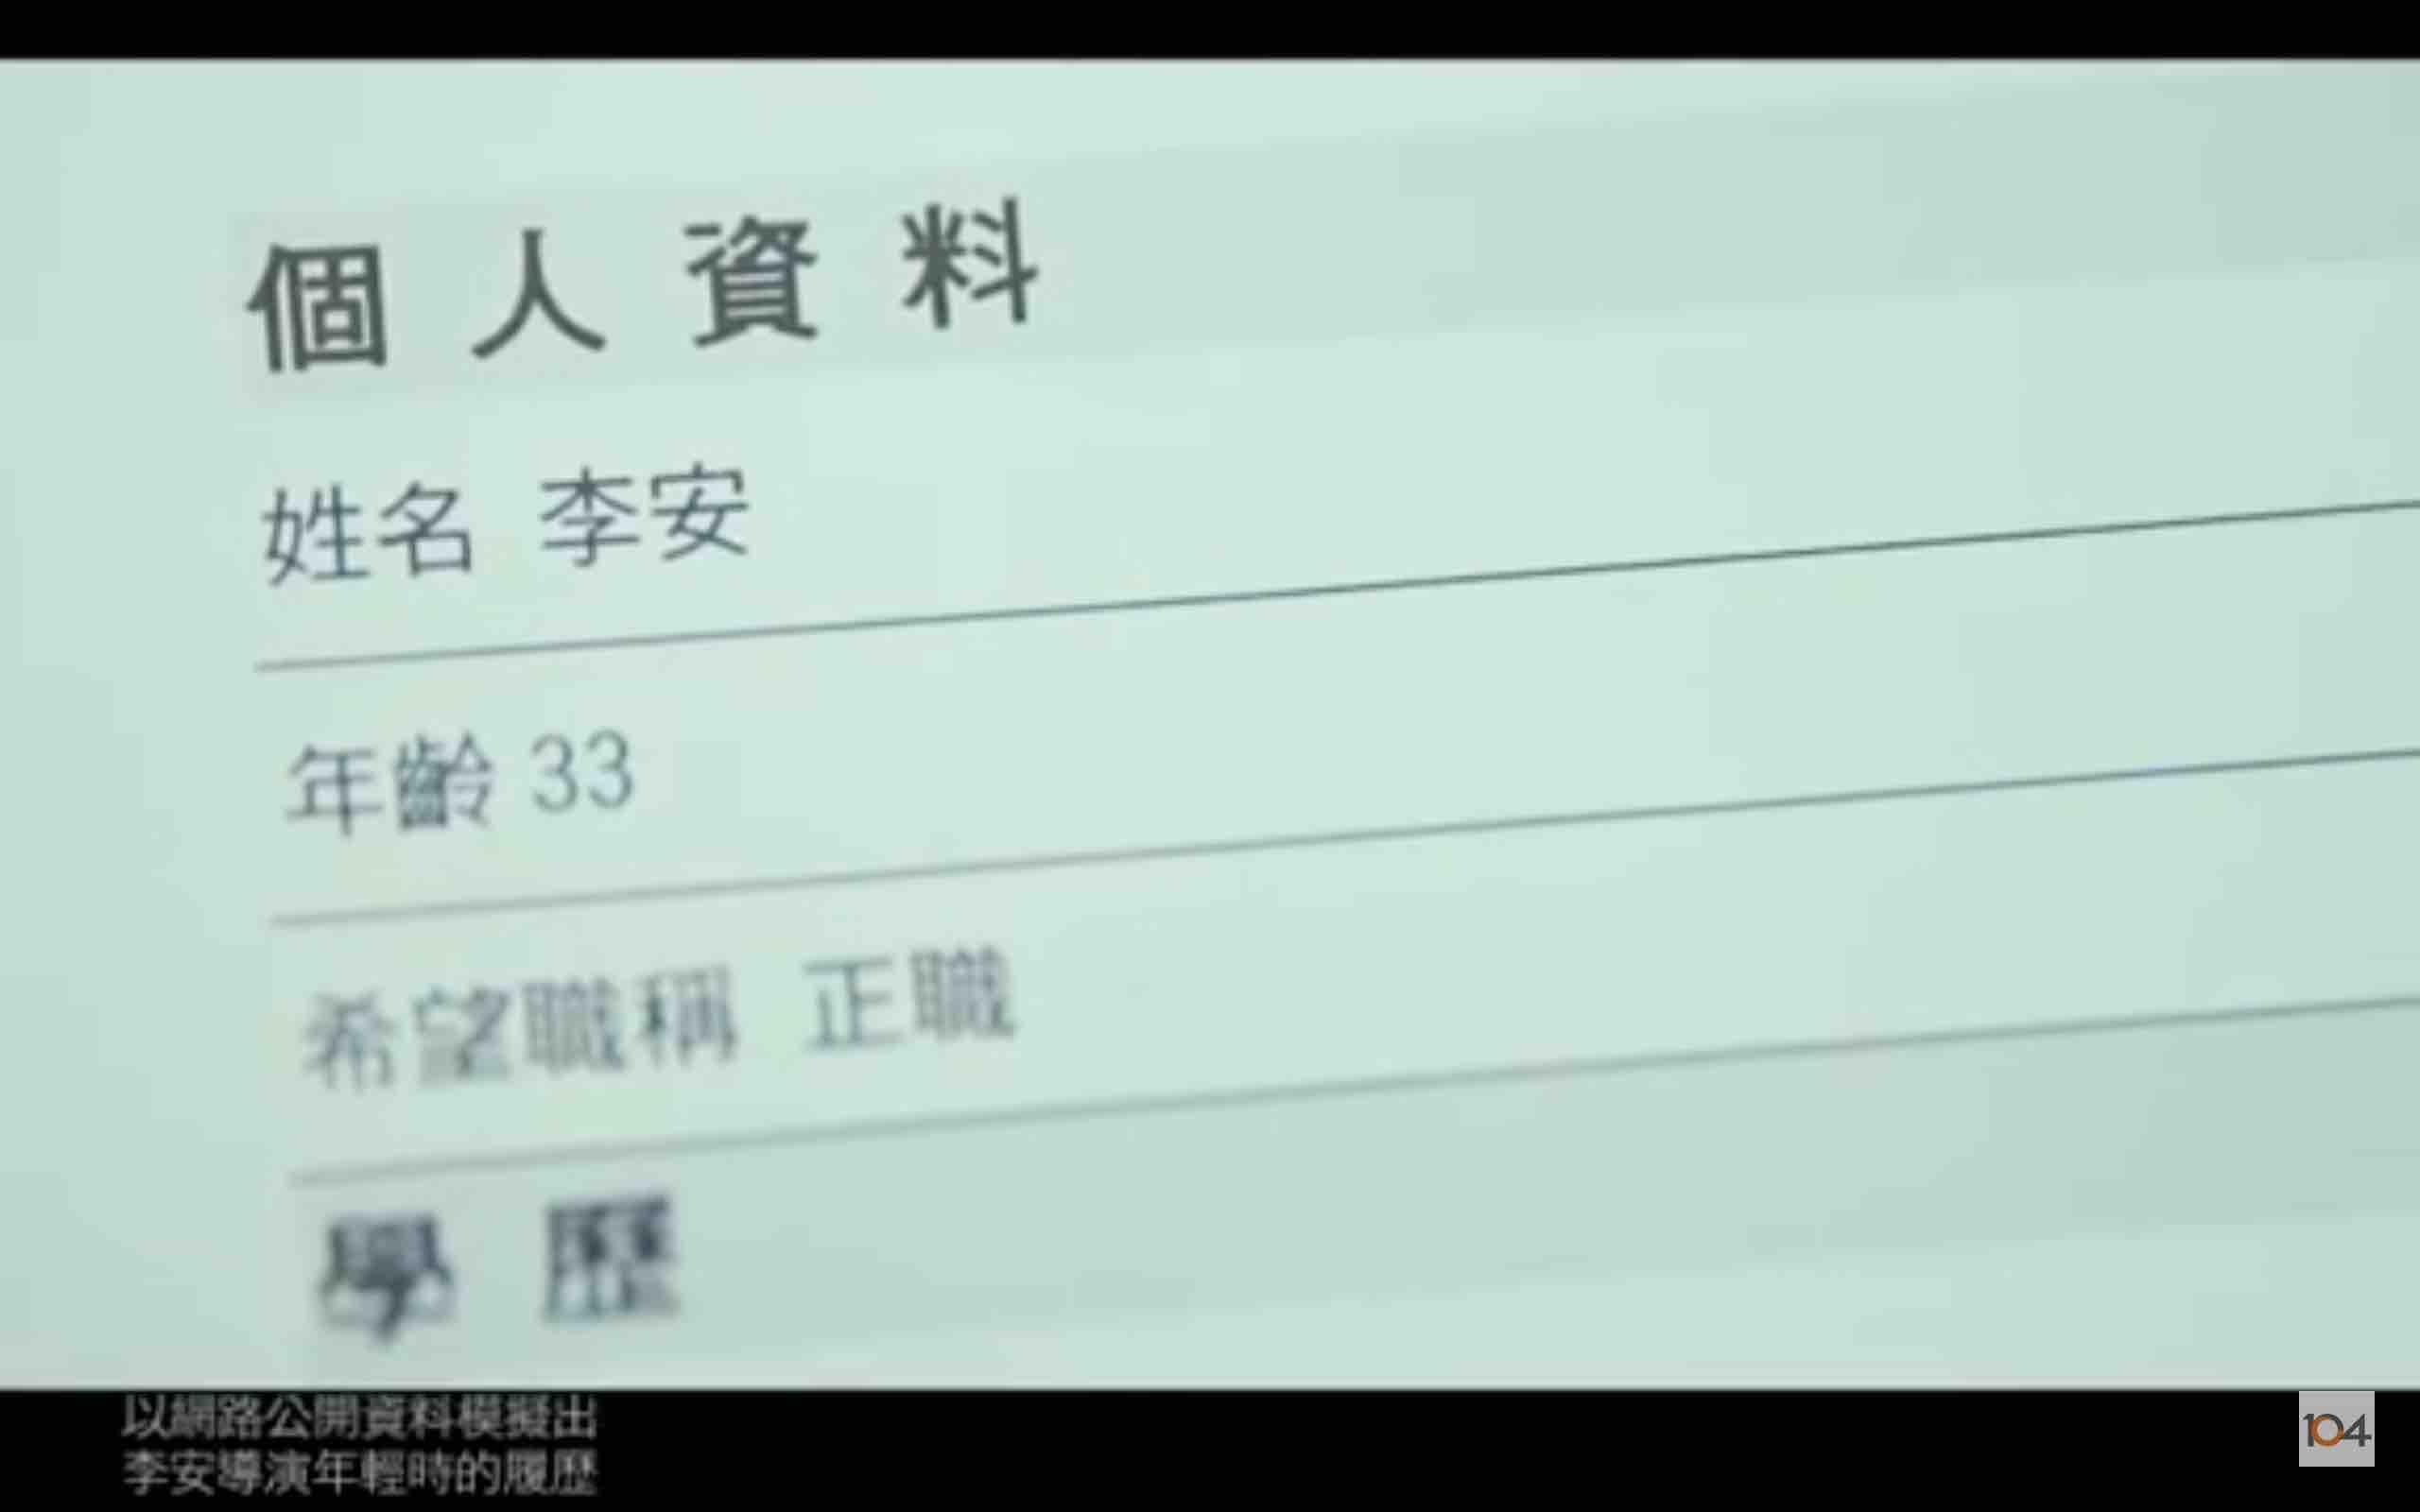 screenshot-2016-10-03-19-03-26